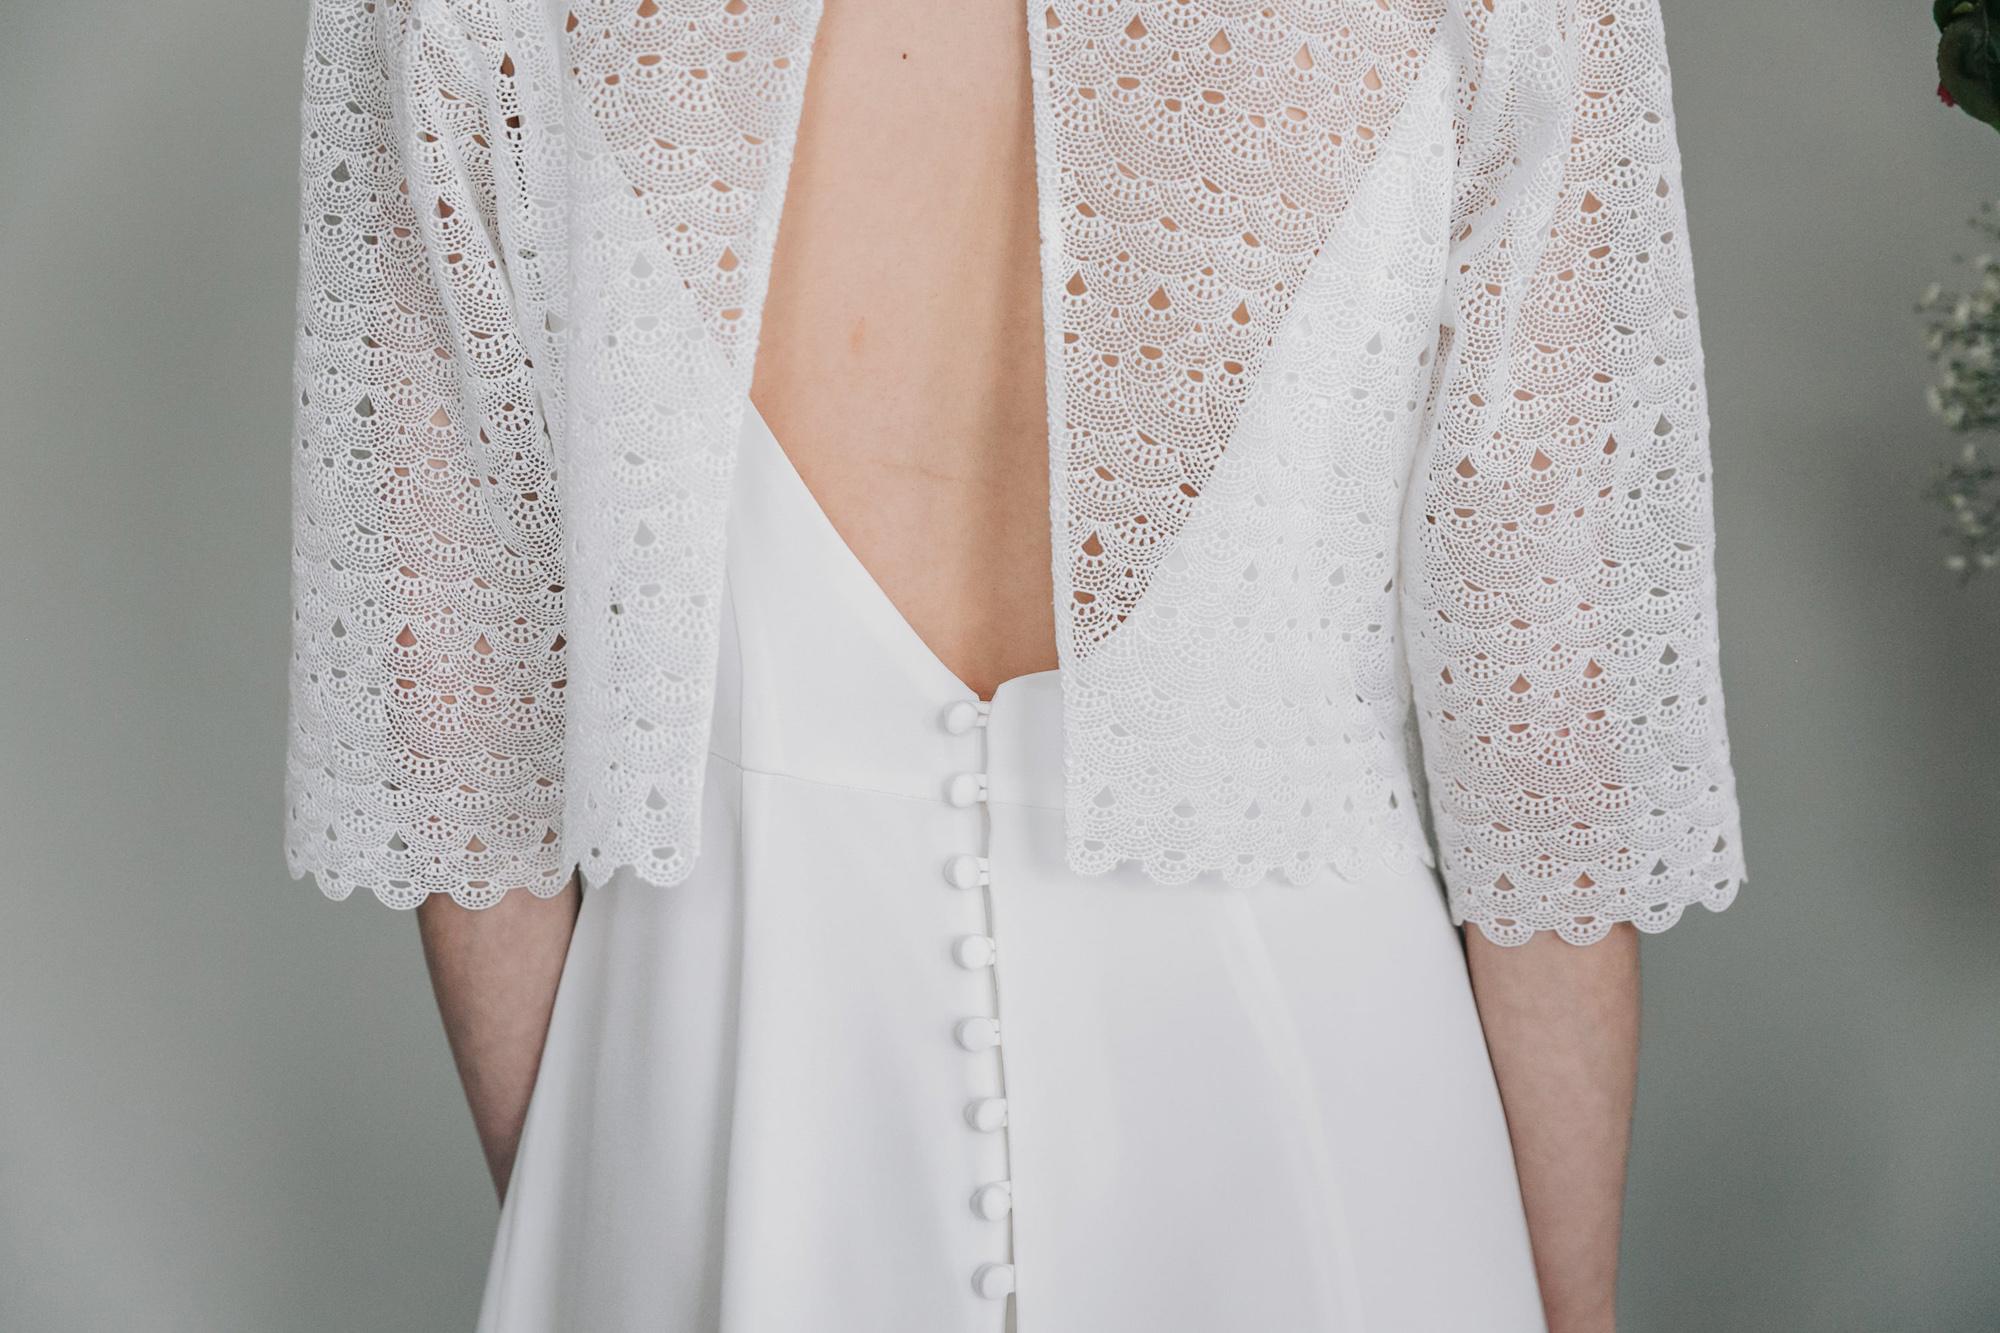 Kate-Beaumont-Sheffield-Freesia-Guipure-Lace-Jacket-Snowdrop-Minimal-Modern-Elegant-Matt-Silk-Wedding-Gown-11.jpg